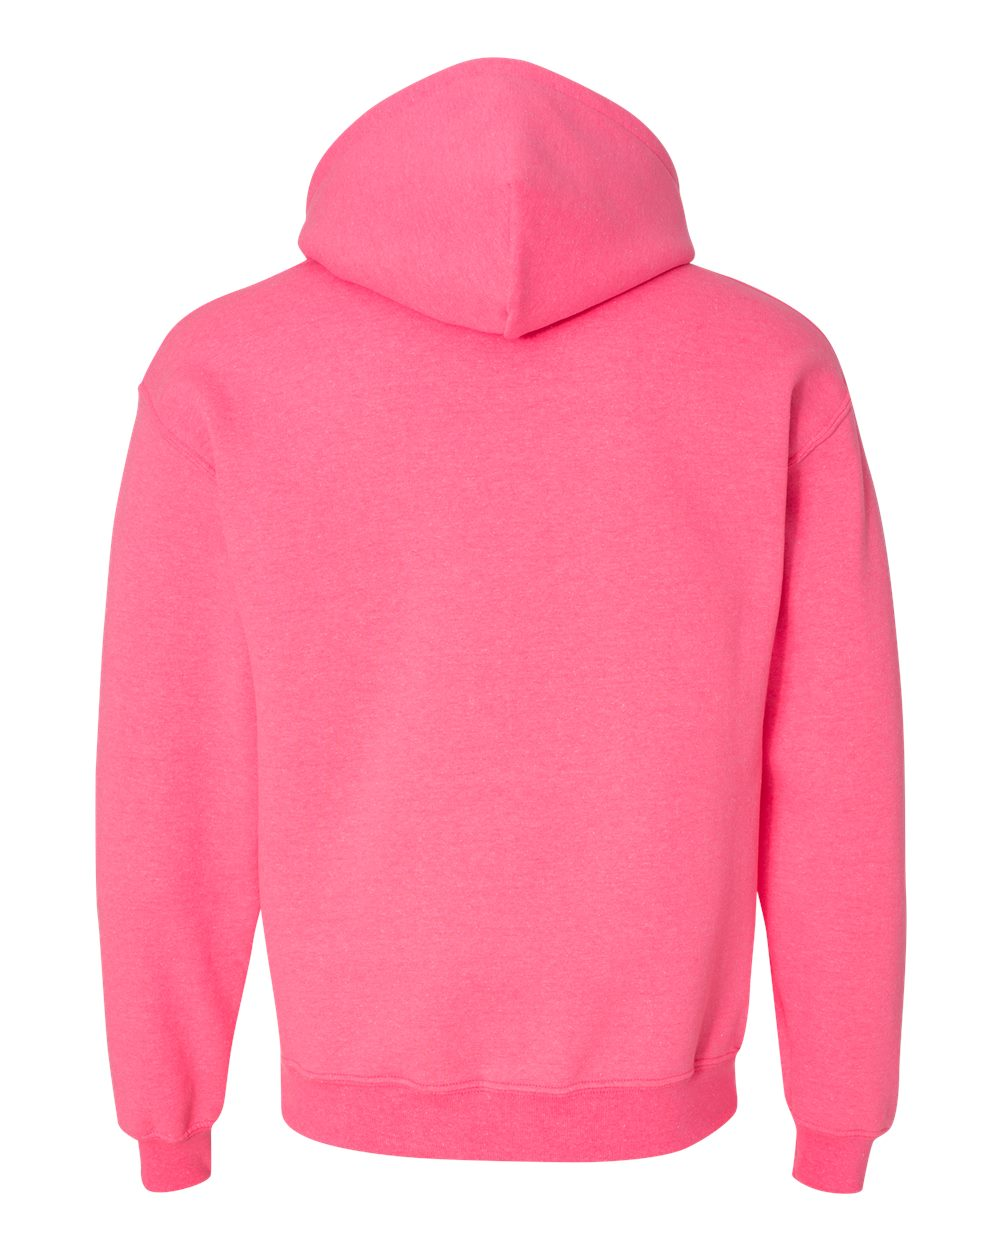 Gildan-Mens-Blank-Hoodie-Heavy-Blend-Hooded-Sweatshirt-Solid-18500-up-to-5XL thumbnail 87